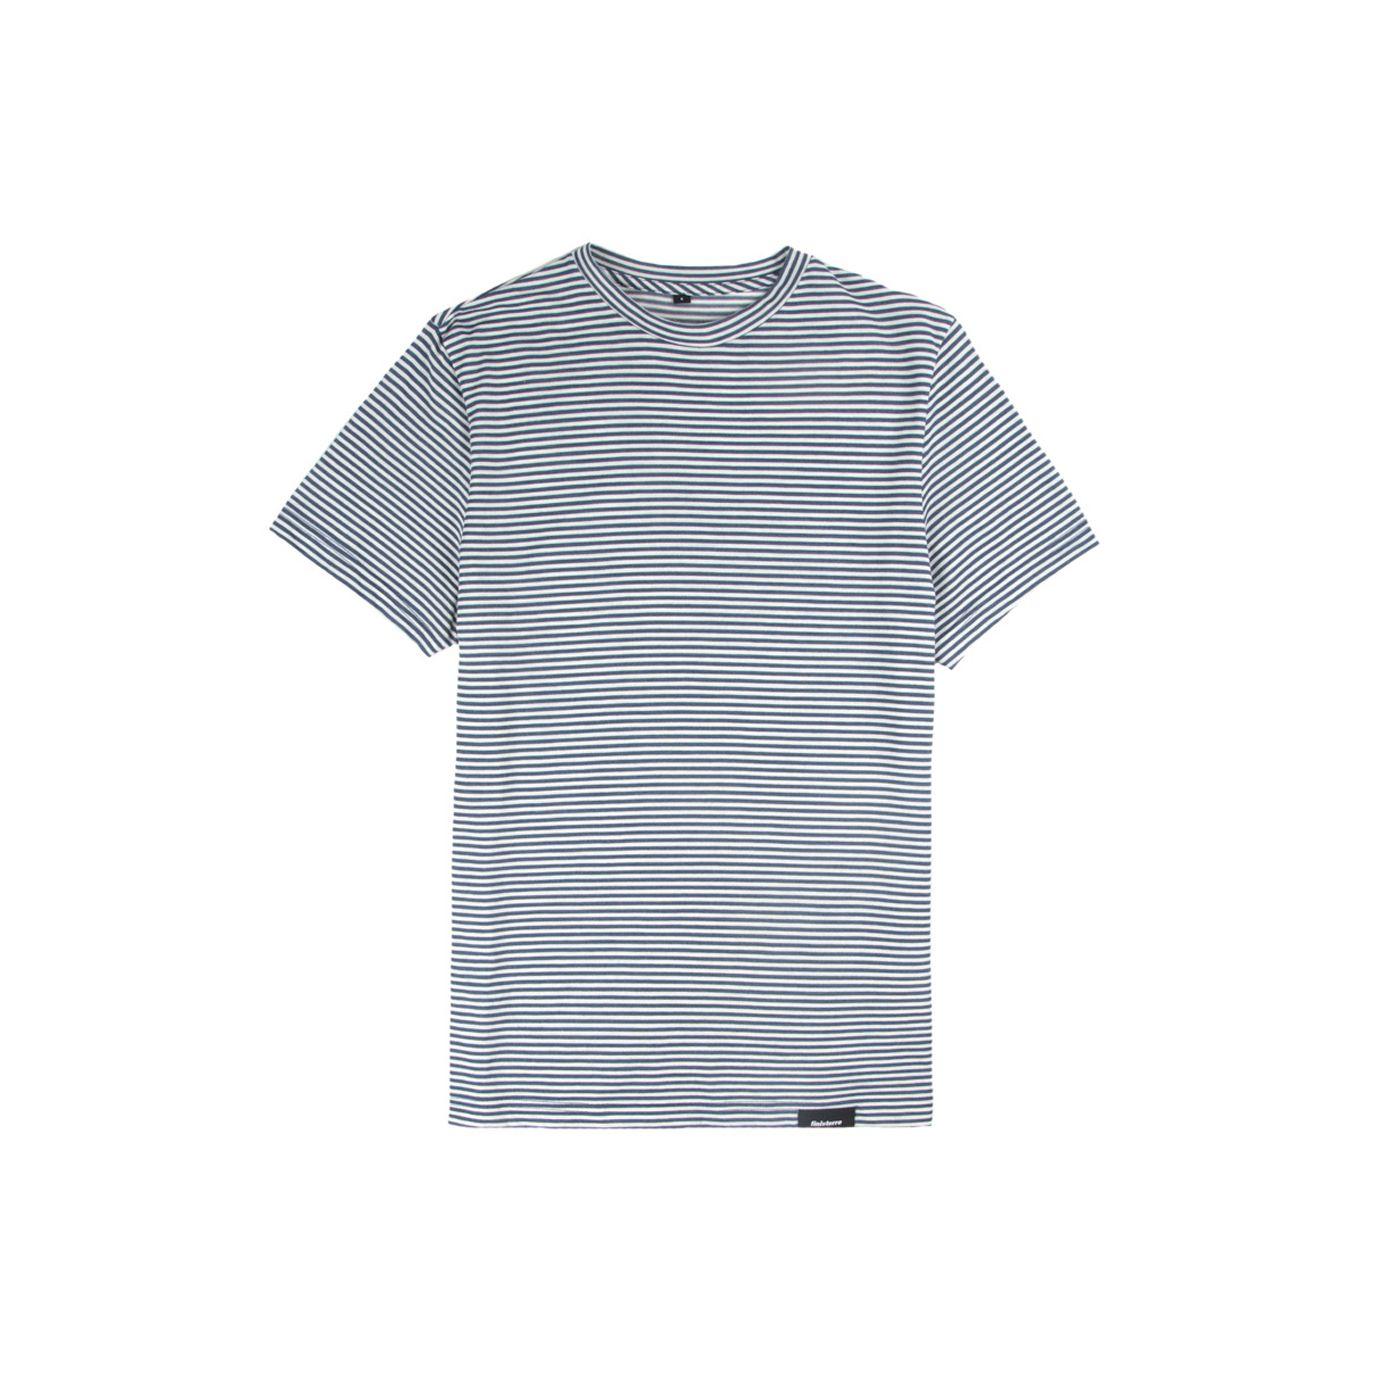 838f73f74e Nike Sb Icon Camo Fill T Shirt (white) - BCD Tofu House